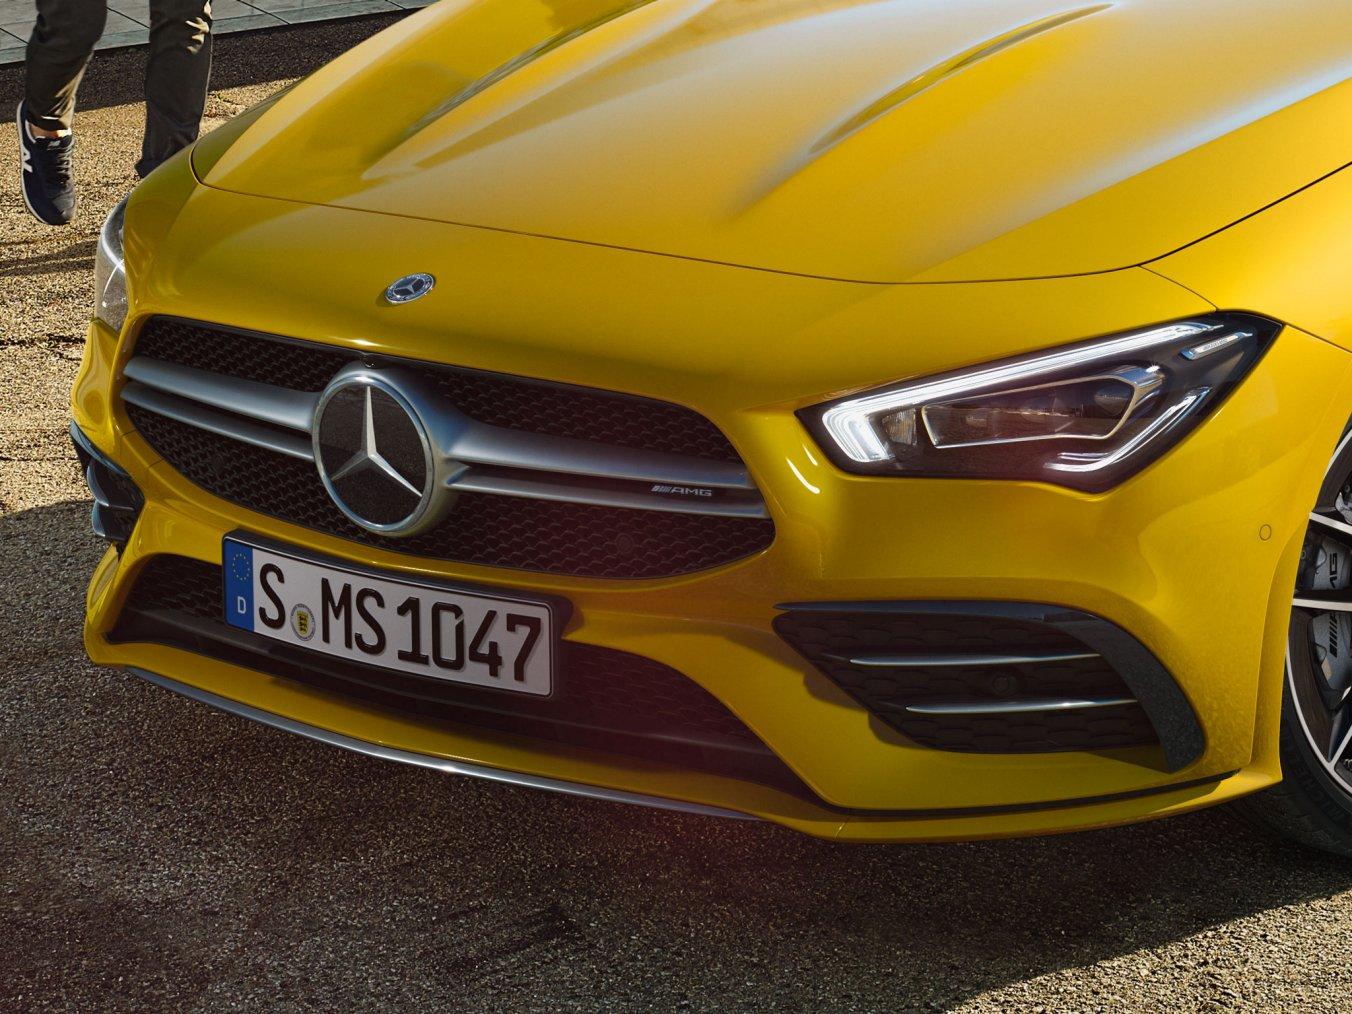 Mercedes-AMG CLA 35 4MATIC Coupé